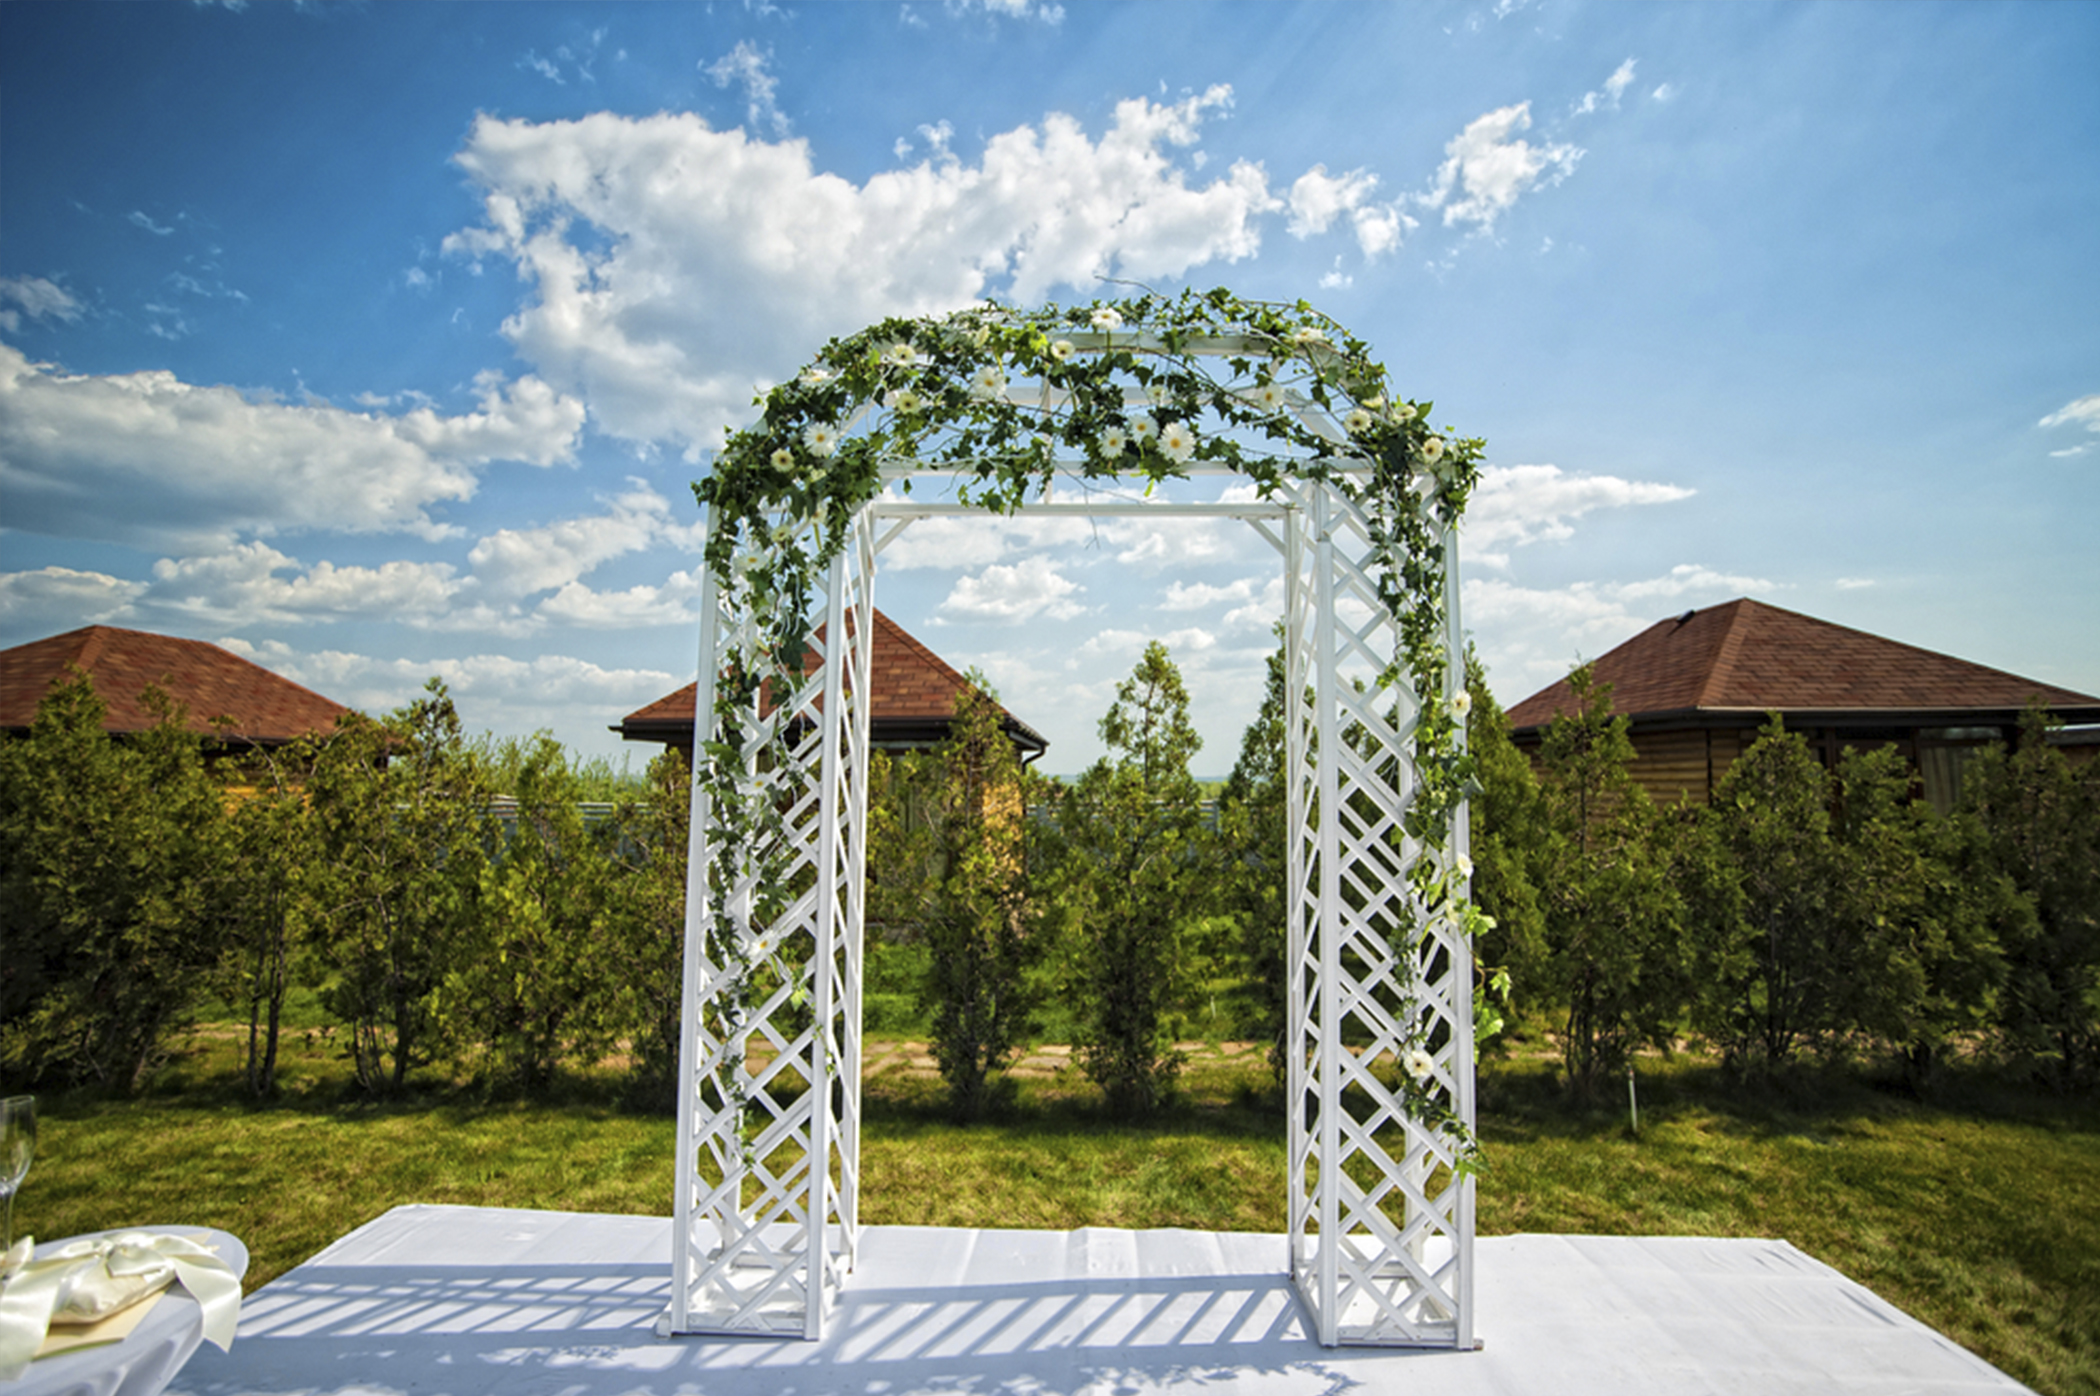 Choosing the Perfect Bridal Arch